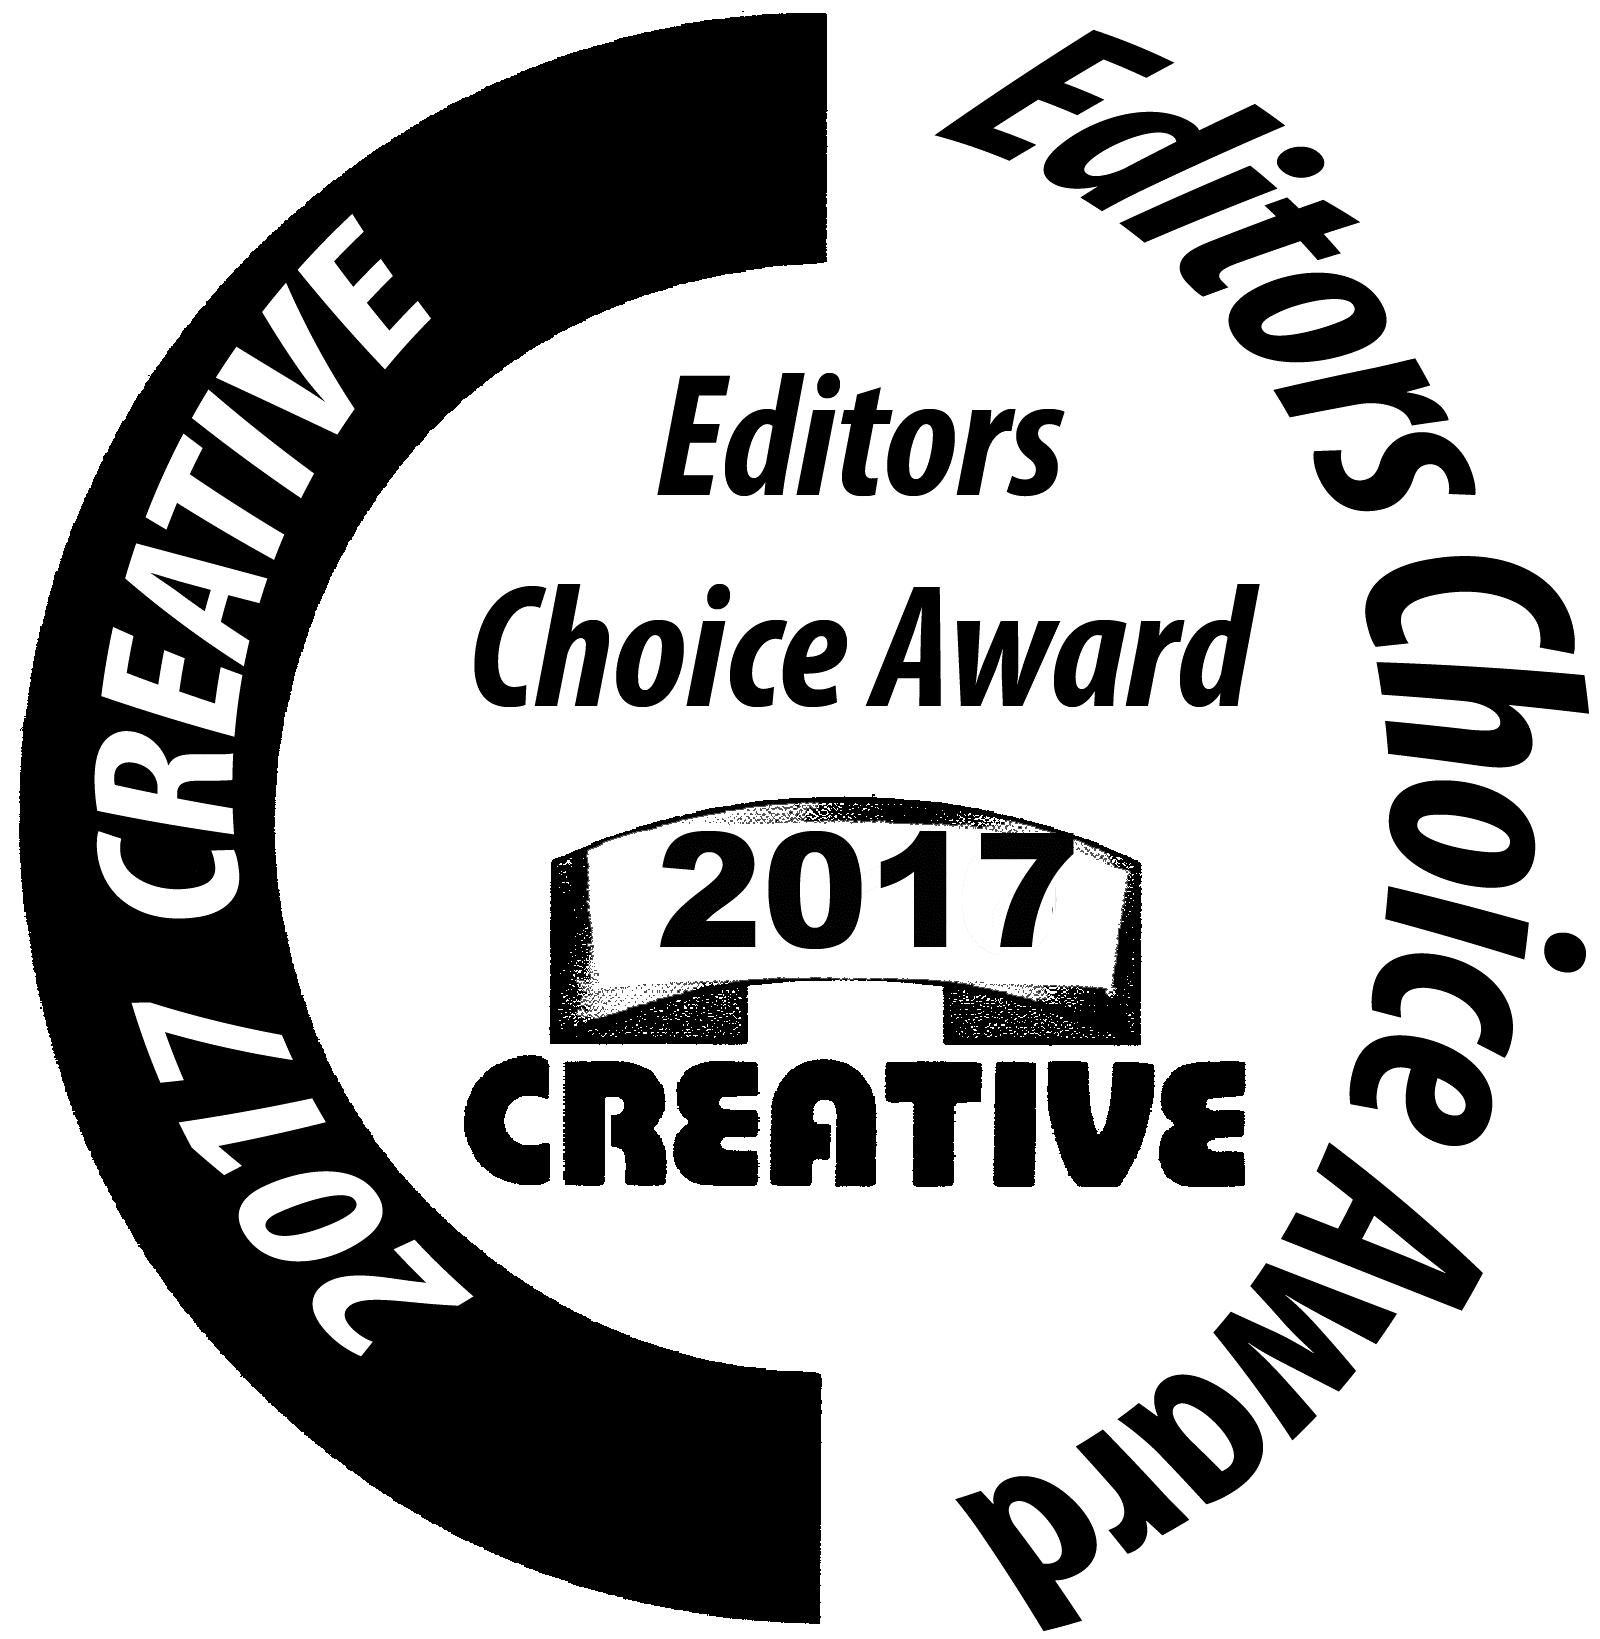 Creative Editors' Choice Award